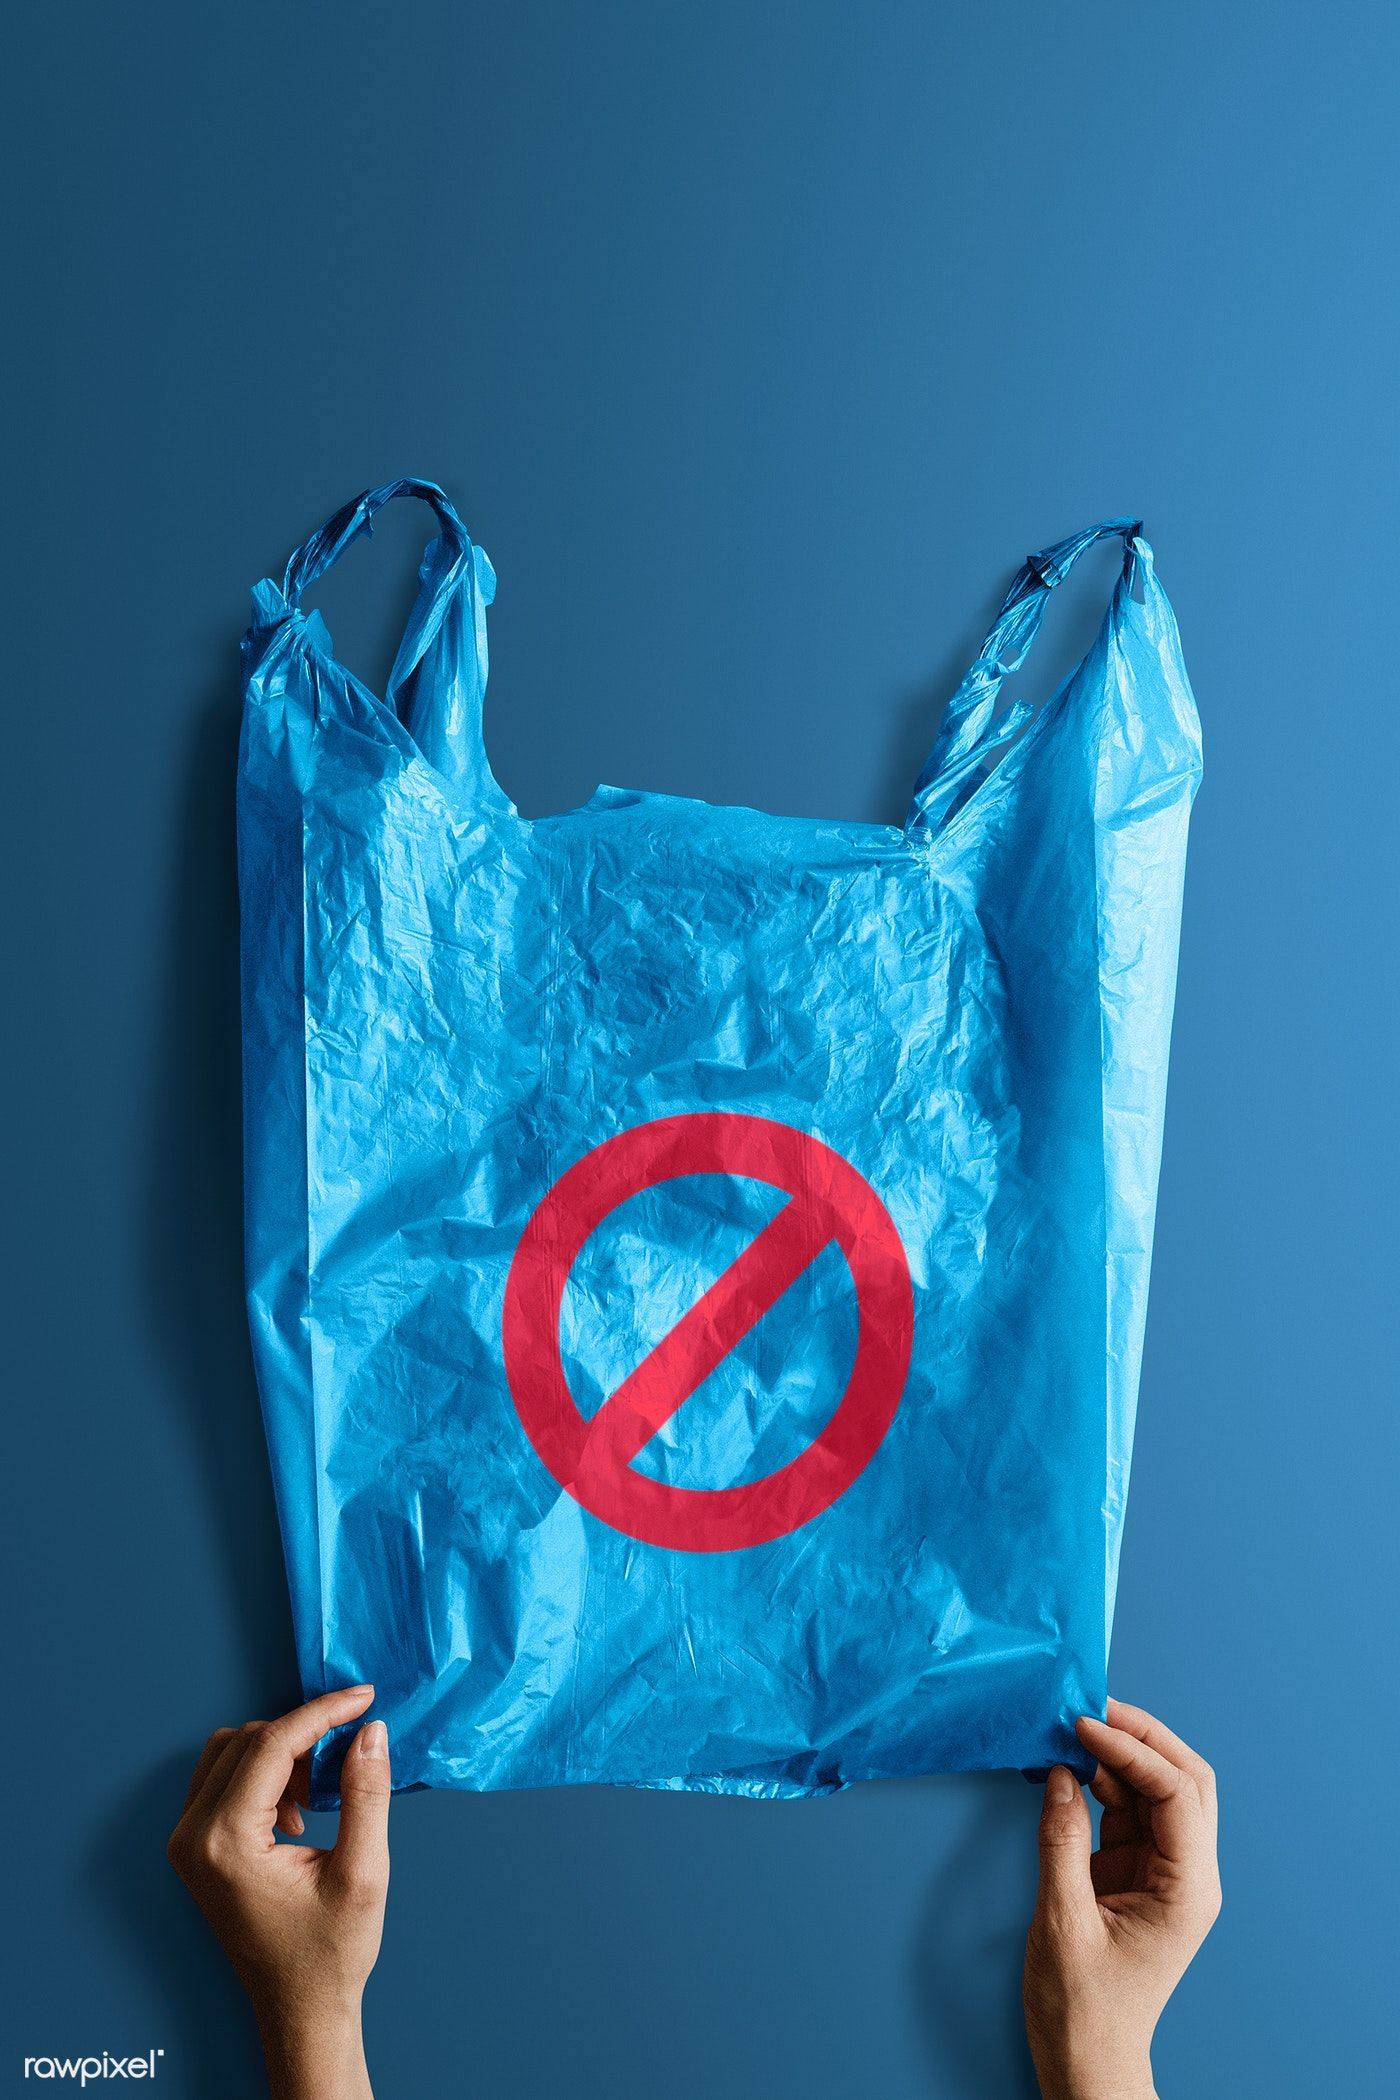 Download Download Premium Psd Of Woman Holding A Blue Plastic Bag Mockup With A Ban Bag Mockup Plastic Bag Design Mockup Free